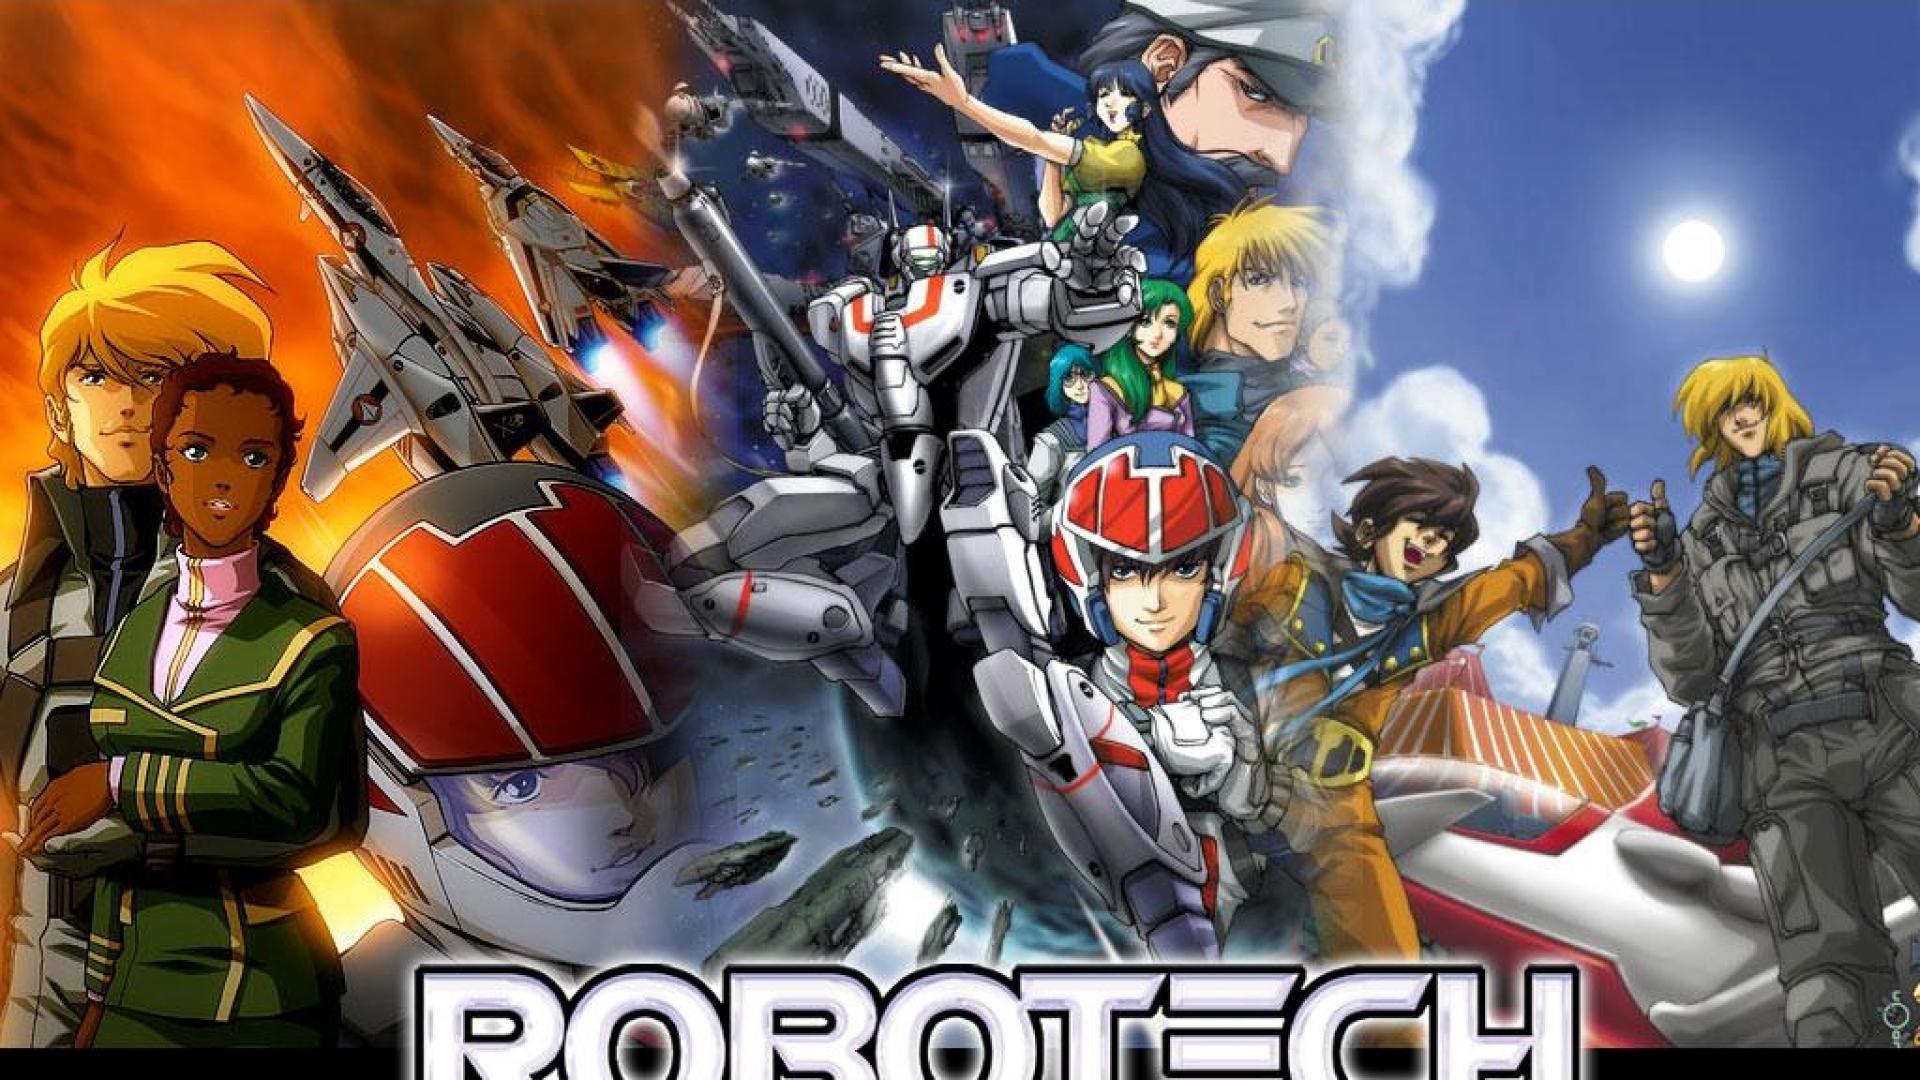 Robotech Wallpapers